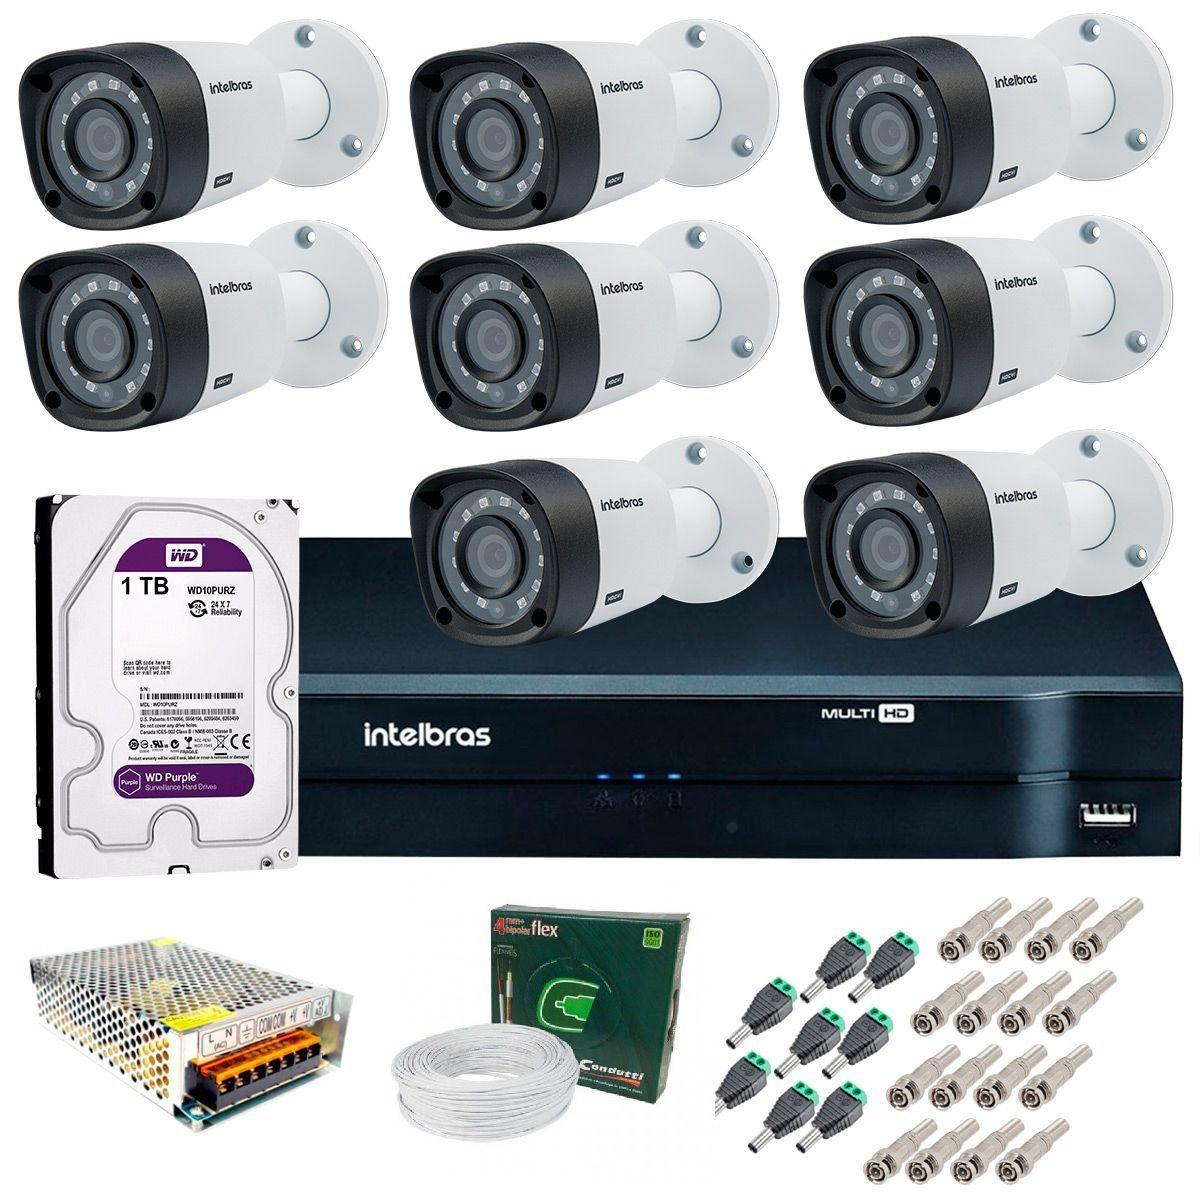 Kit 8 Câmeras de Segurança HD 720p Intelbras VHD 3130 B G4 + DVR Multi HD + HD 1TB + Acessórios